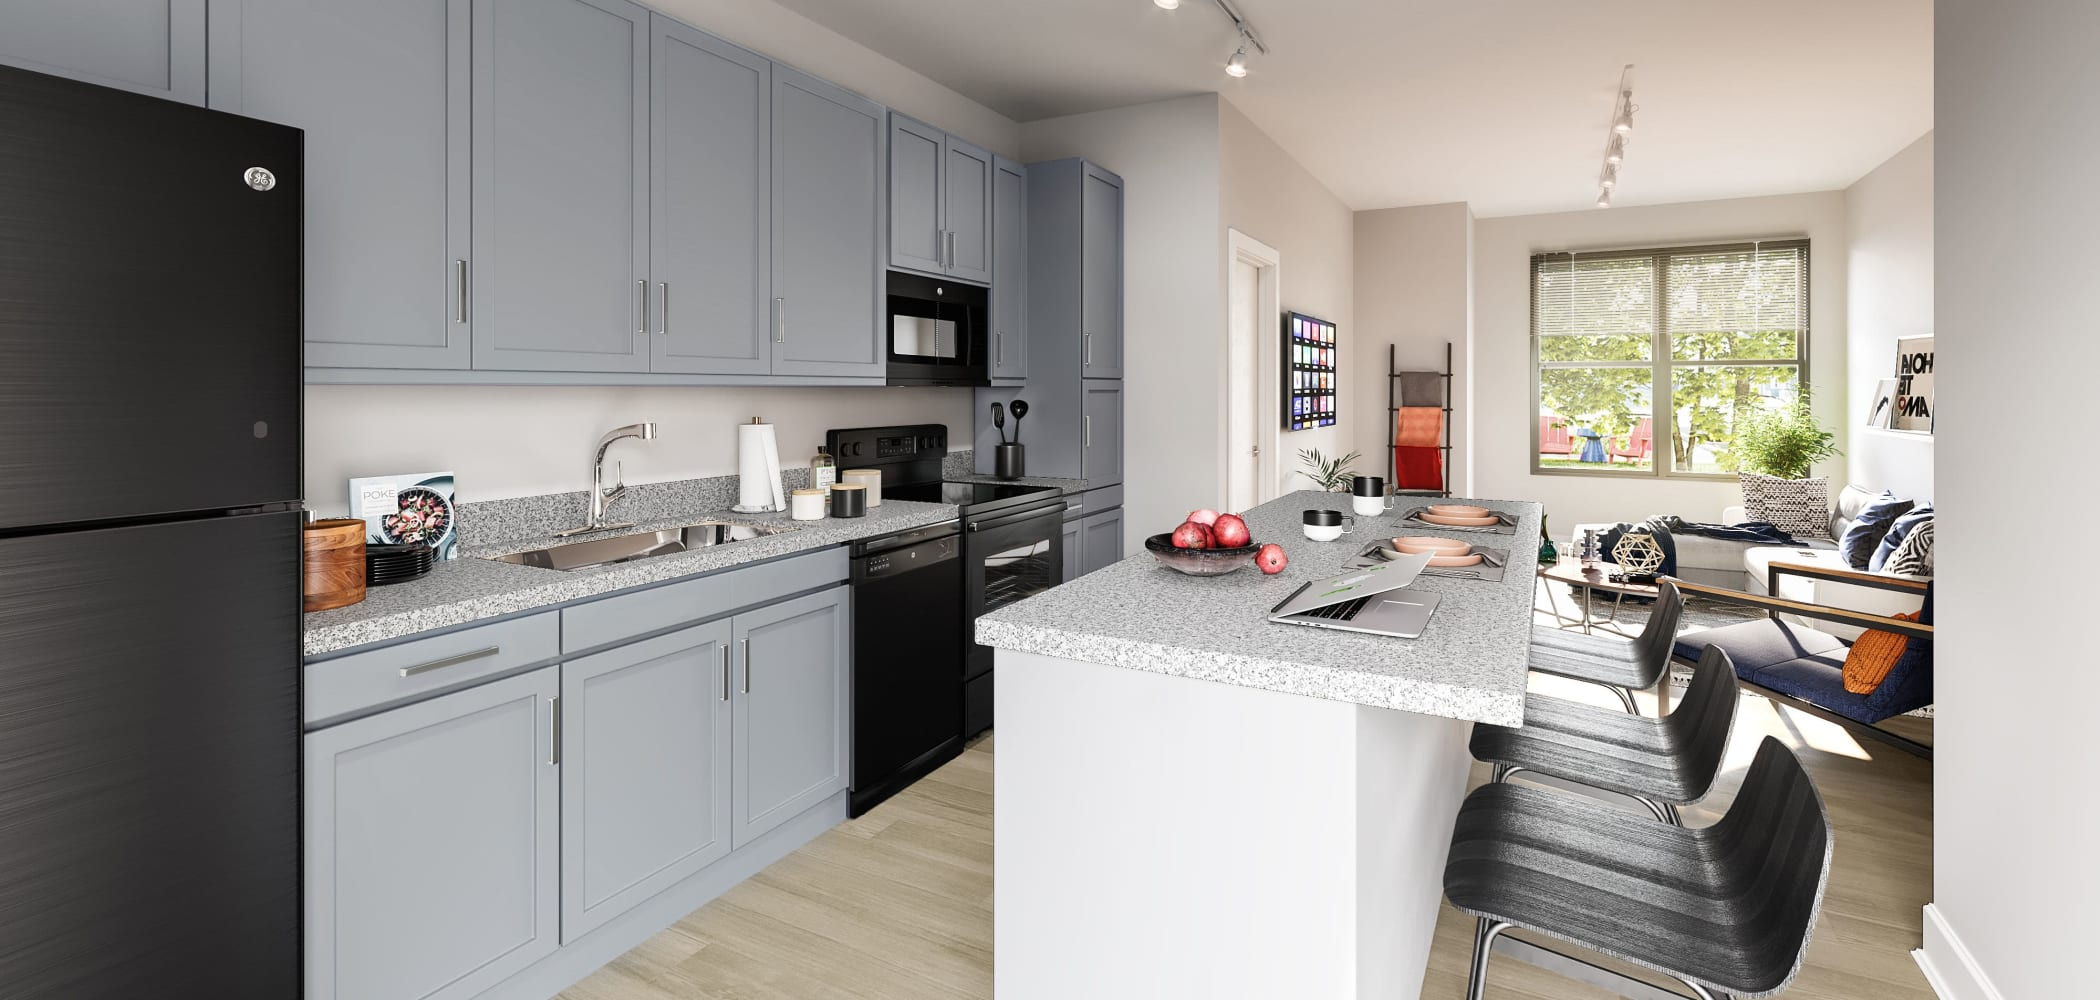 Sleek, modern kitchen at LATITUDE on Hillsborough in Raleigh, North Carolina